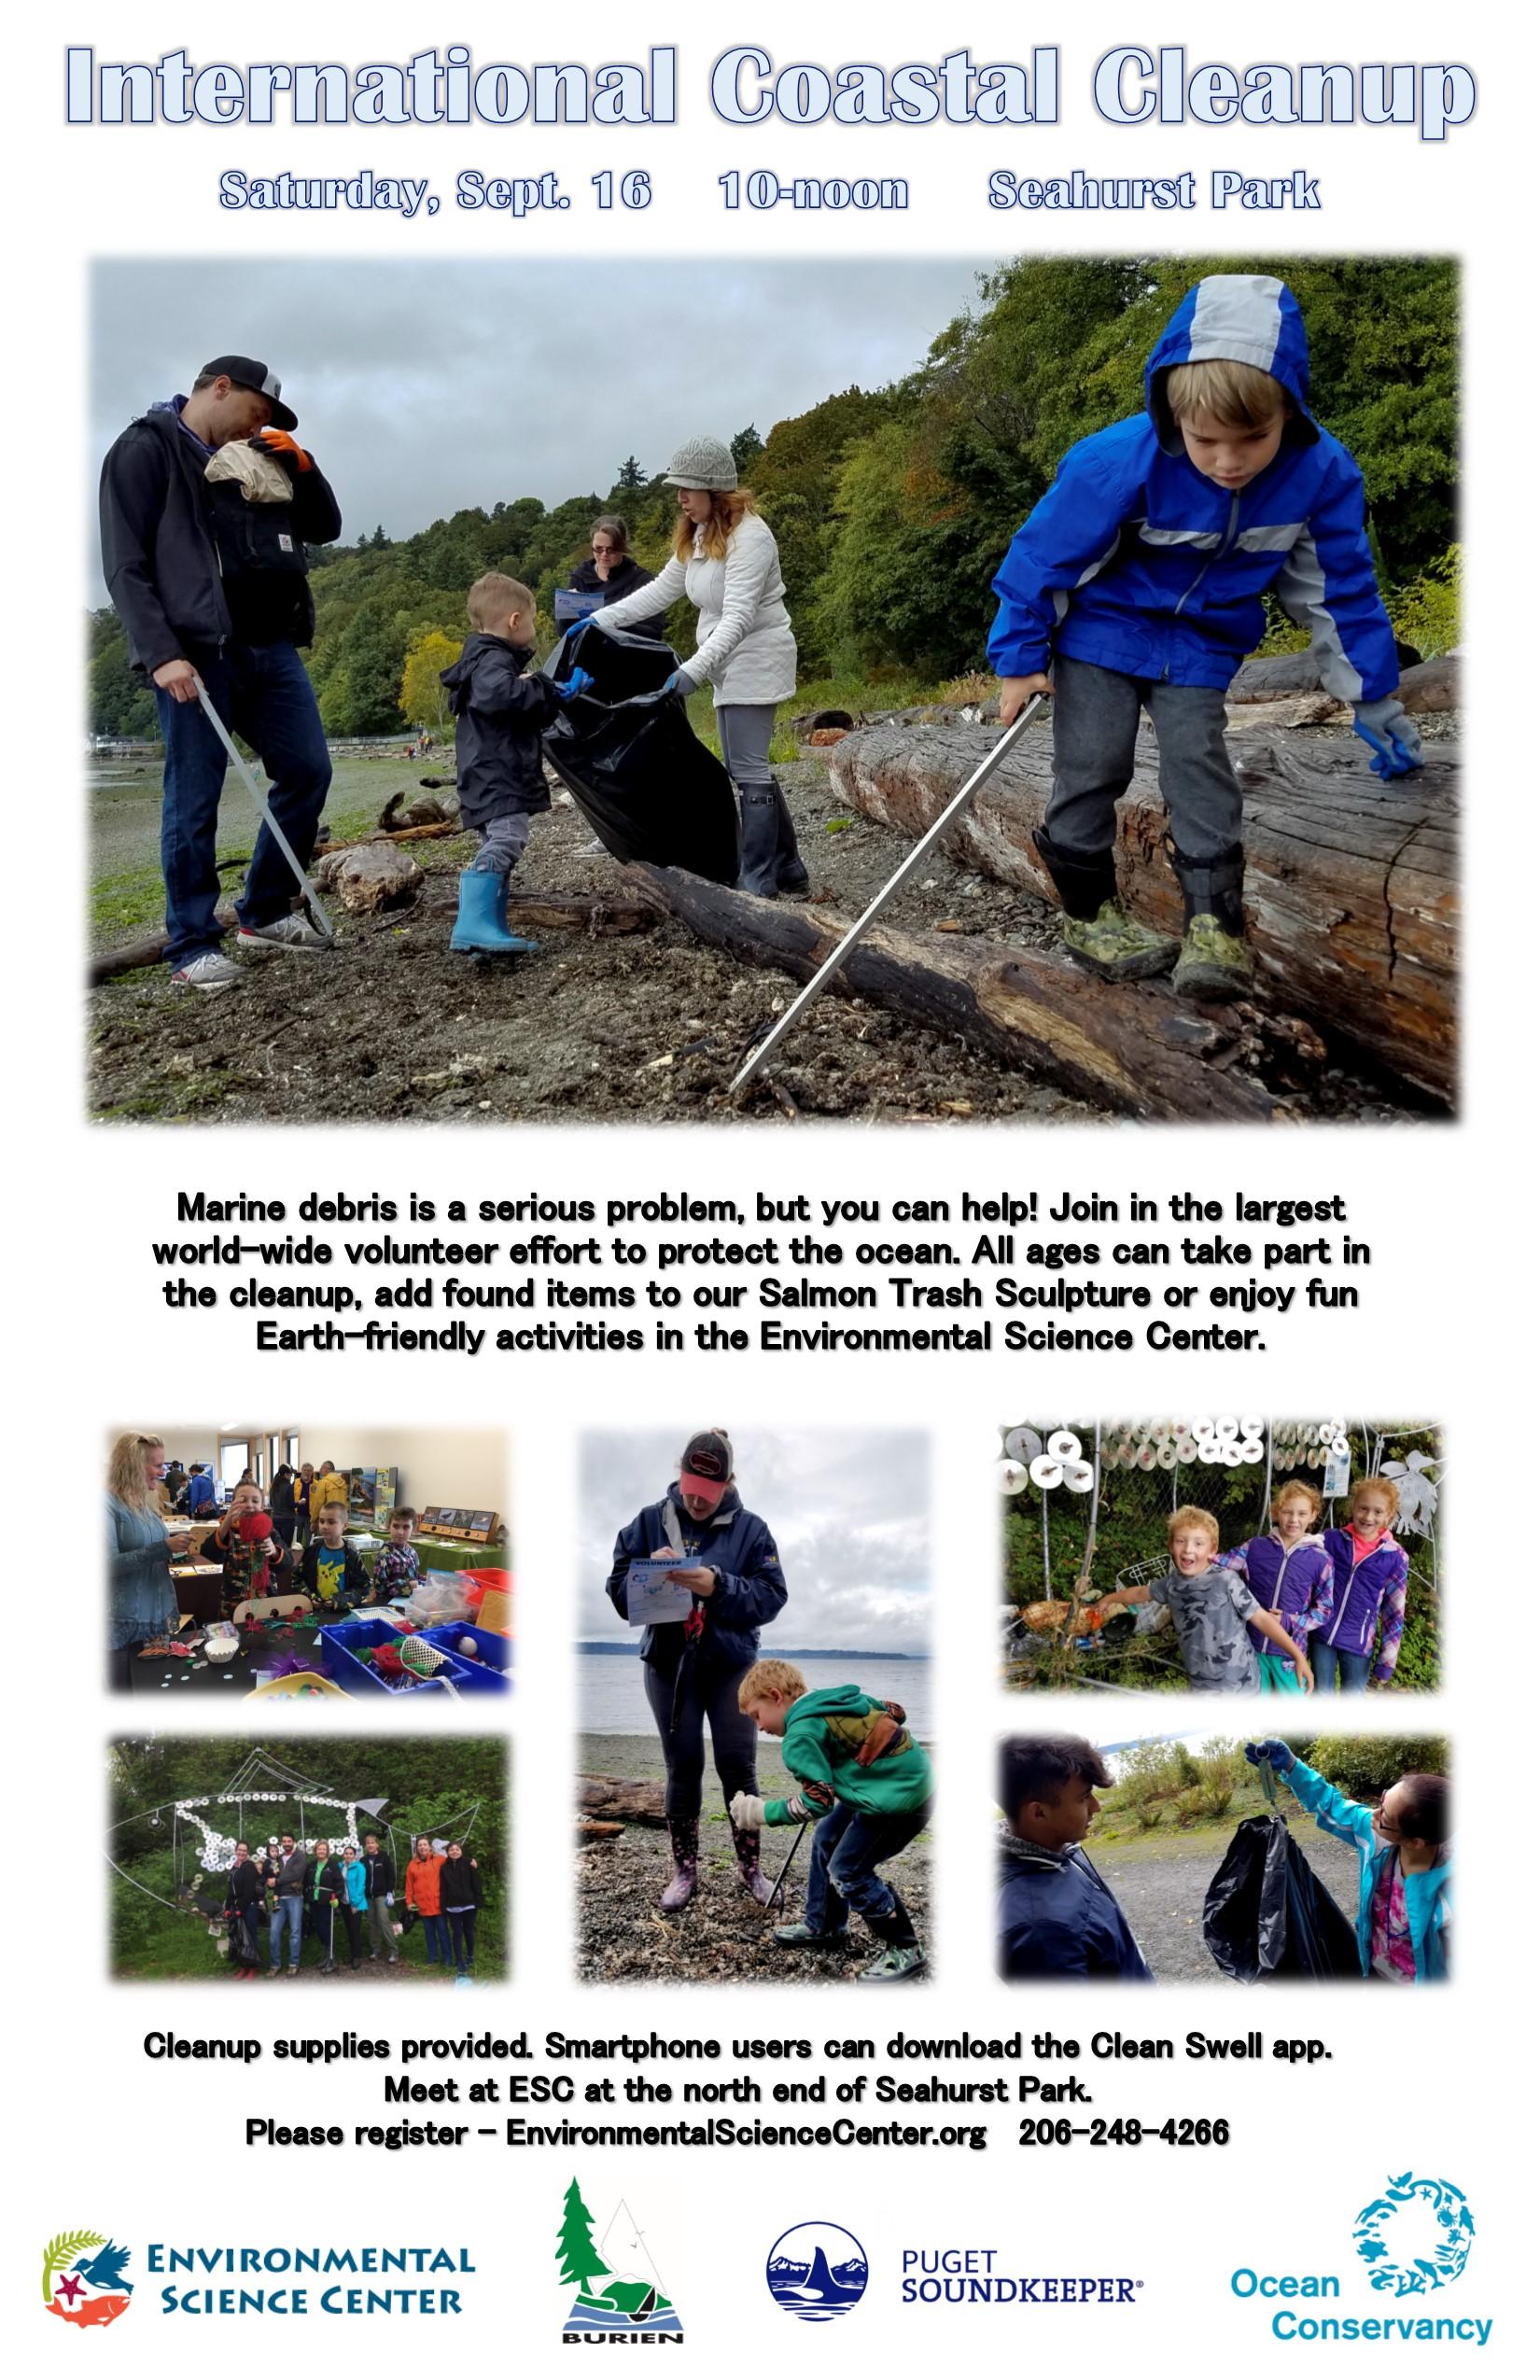 2016.09 International Coastal Cleanup flyer 11x17